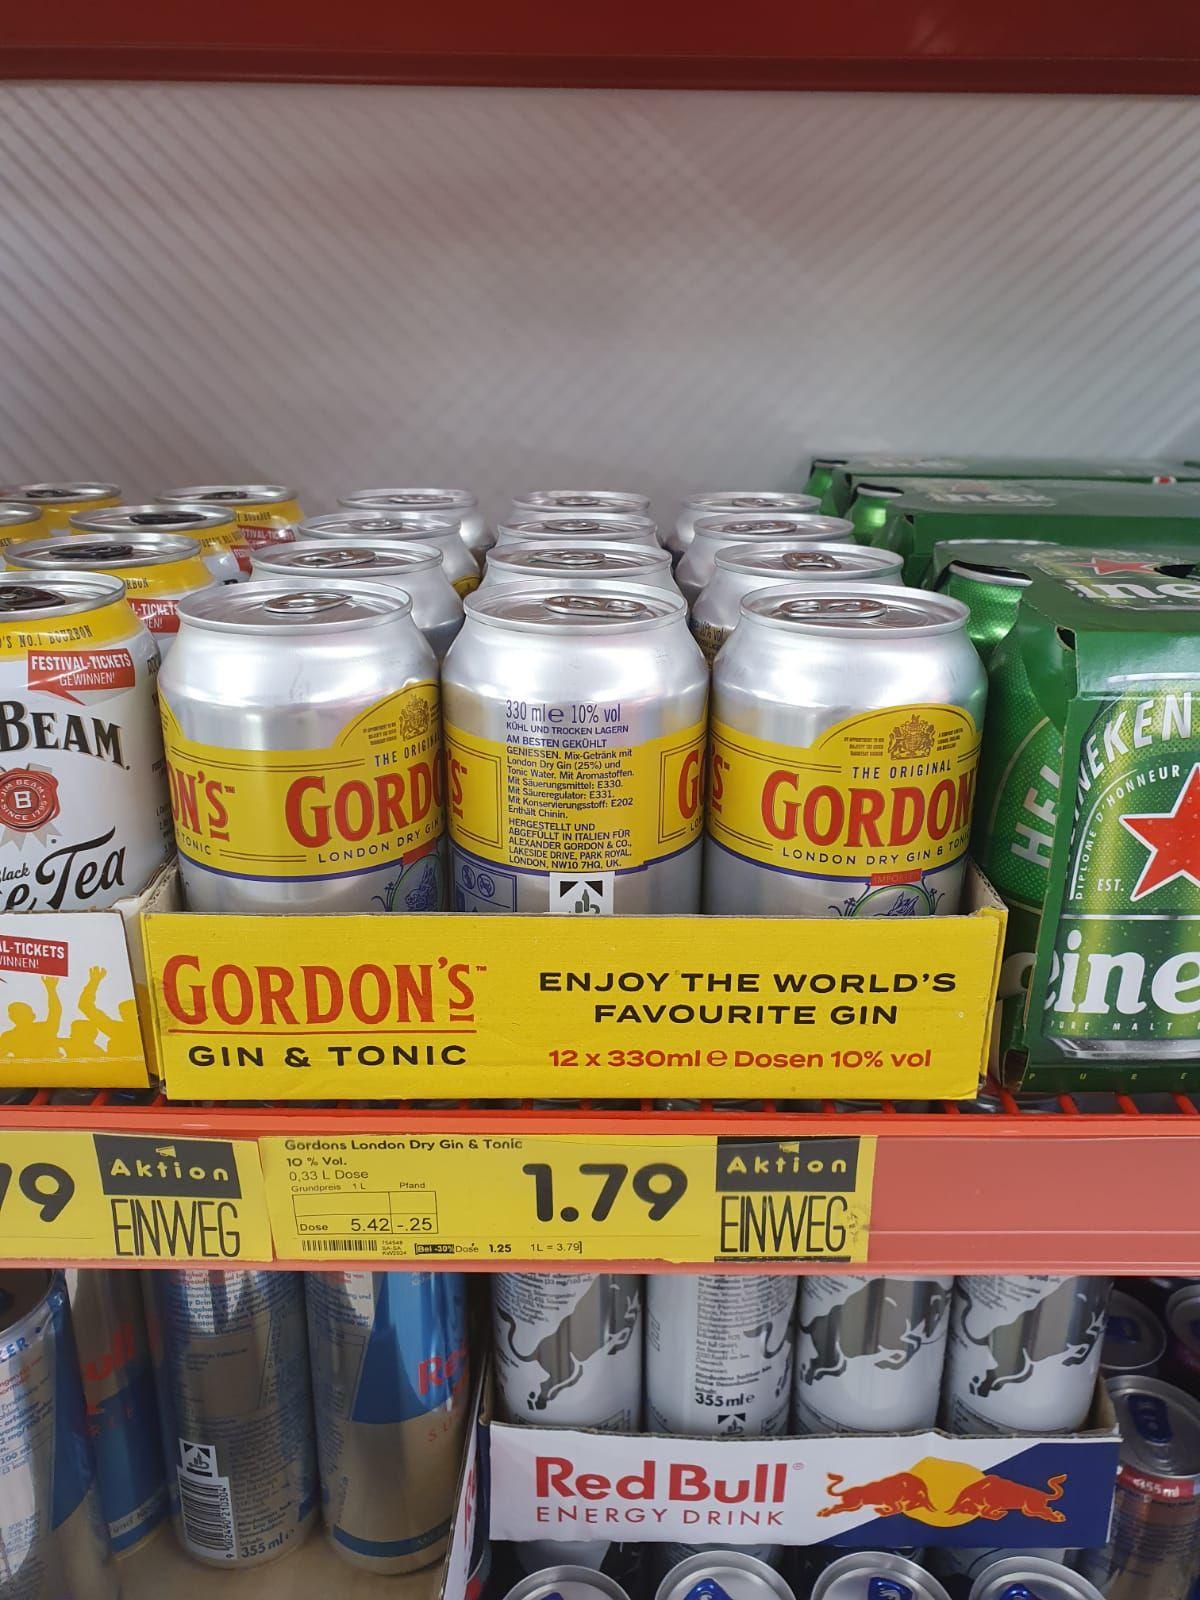 Jim Beam & Cola / Gordon's London Dry Gin & Tonic